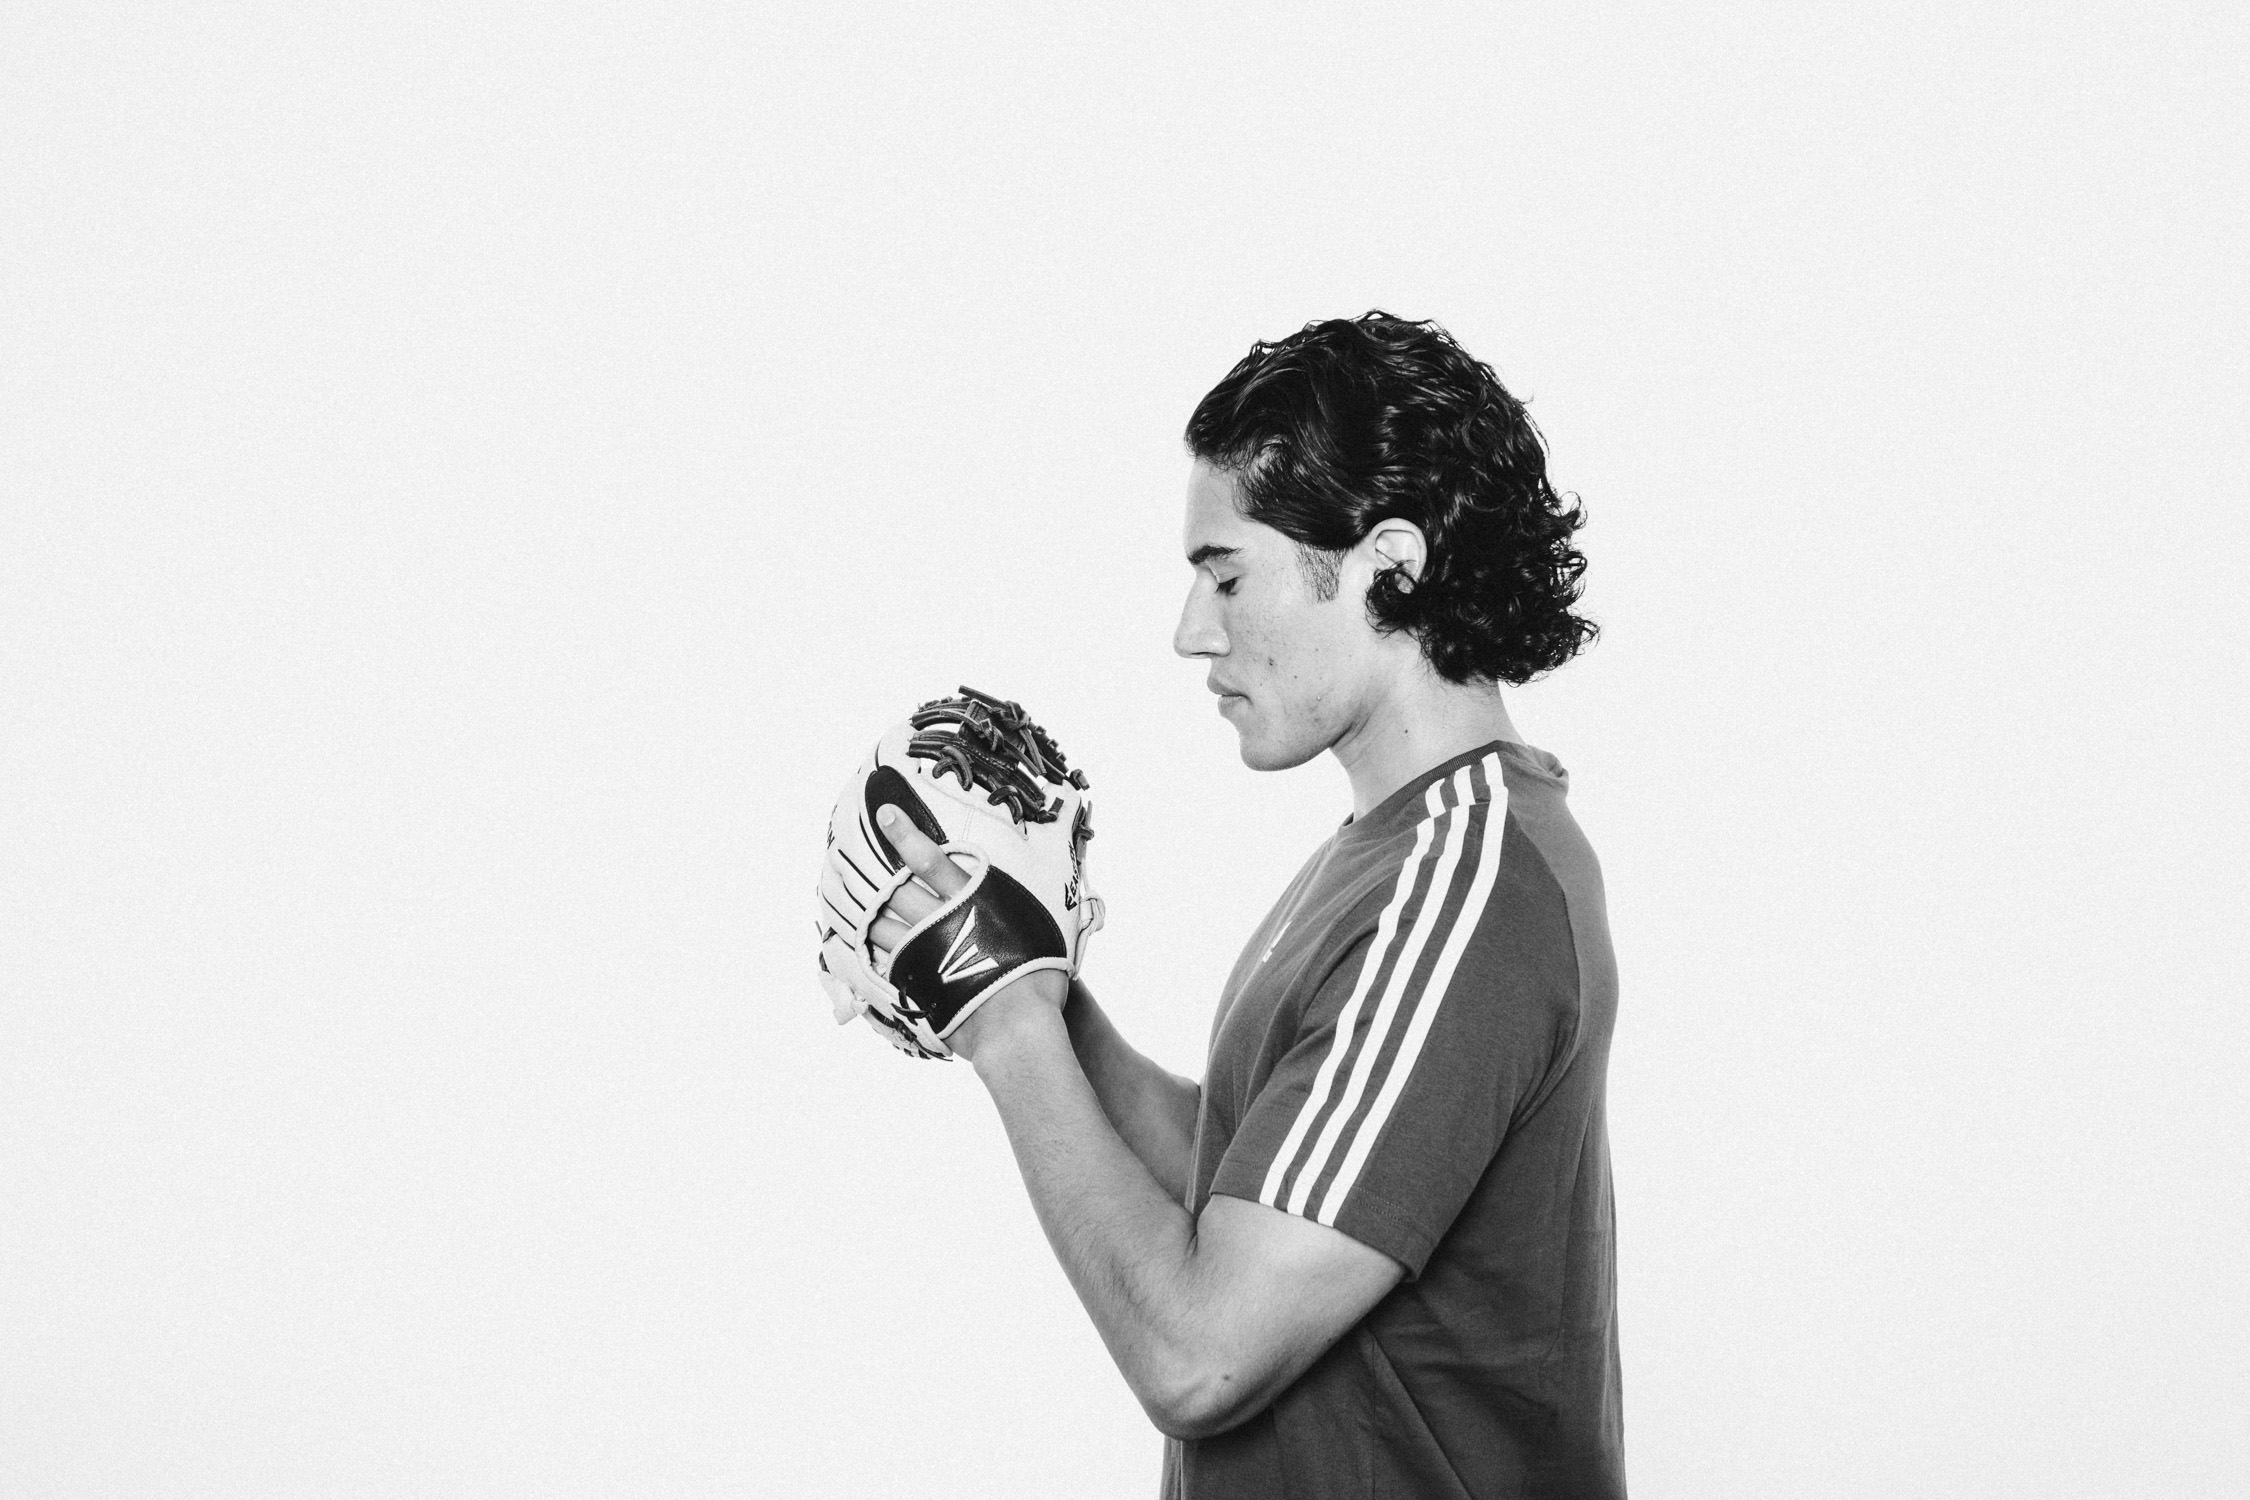 Adidas Portraits-6830.jpg